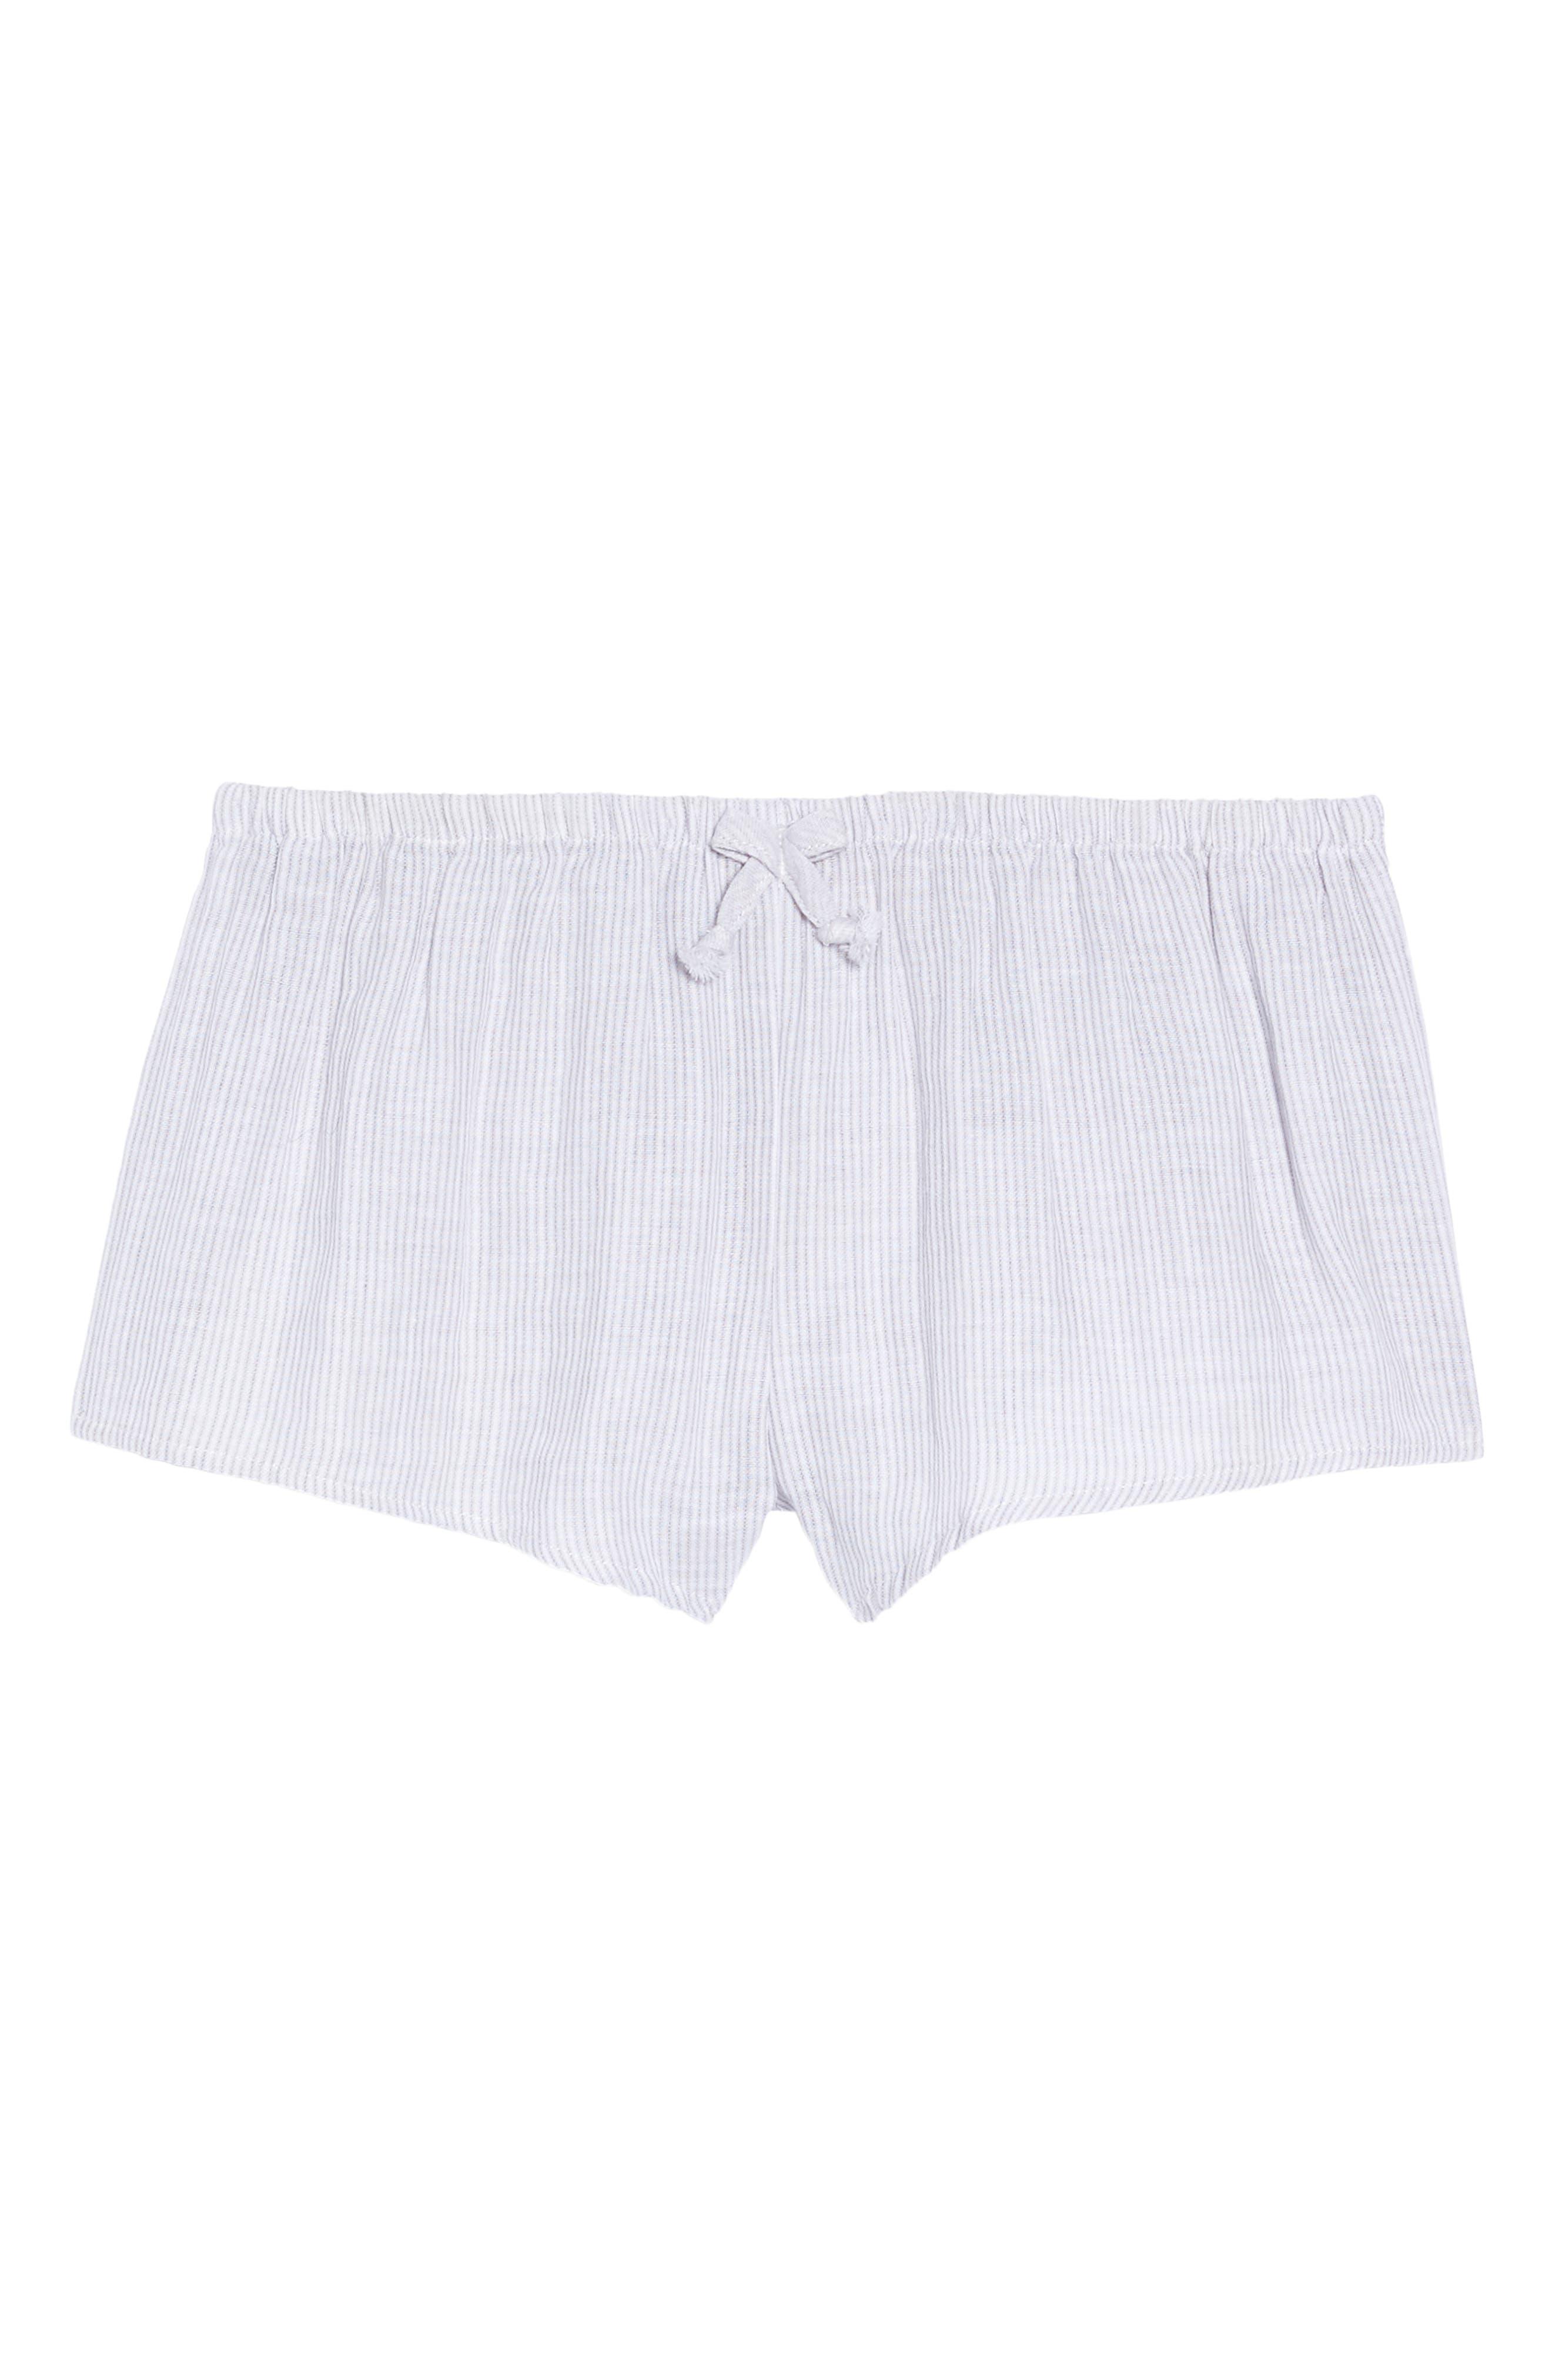 Stripe Pajama Shorts,                             Alternate thumbnail 4, color,                             Grey/ White